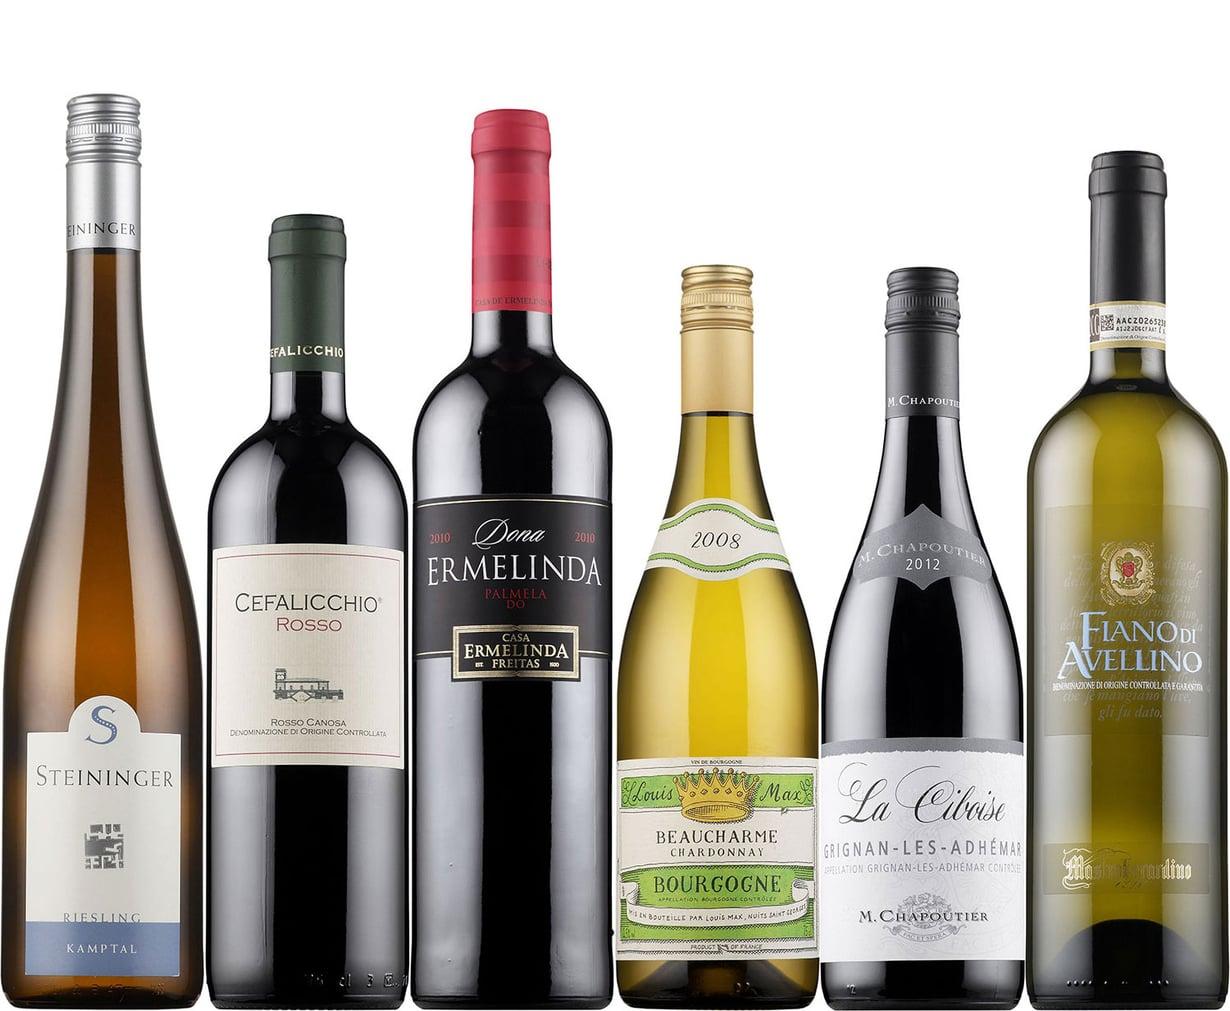 Vasemmalta lukien Steininger Riesling, Cefalicchio Rosso, Dona Ermelinda, Louis Max Beaucharme Chardonnay, La Ciboise ja Mastroberardino Fiano di Avellino. Kuvat: Alko.